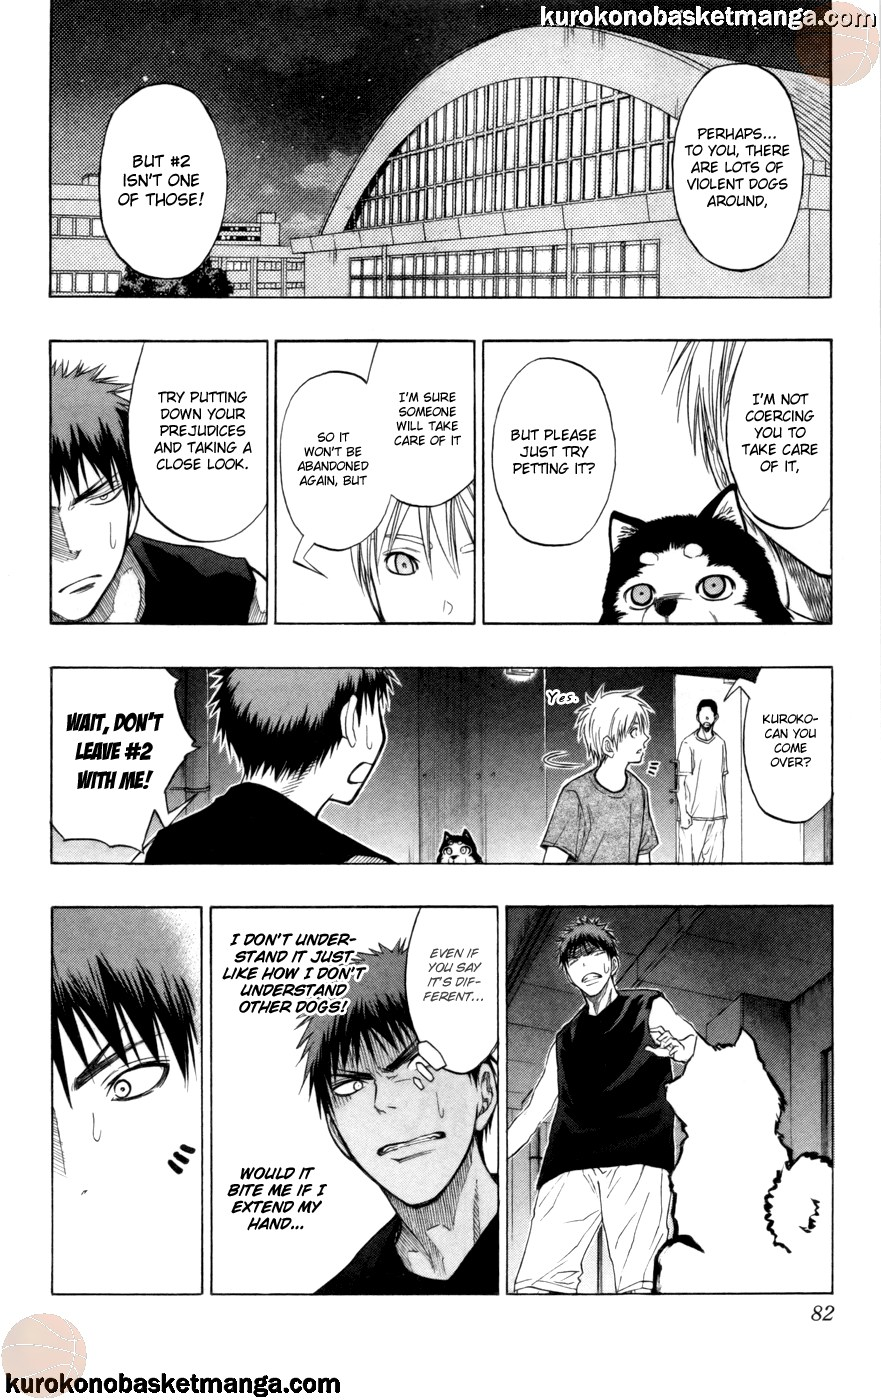 Kuroko no Basket Manga Chapter 74 - Image 16